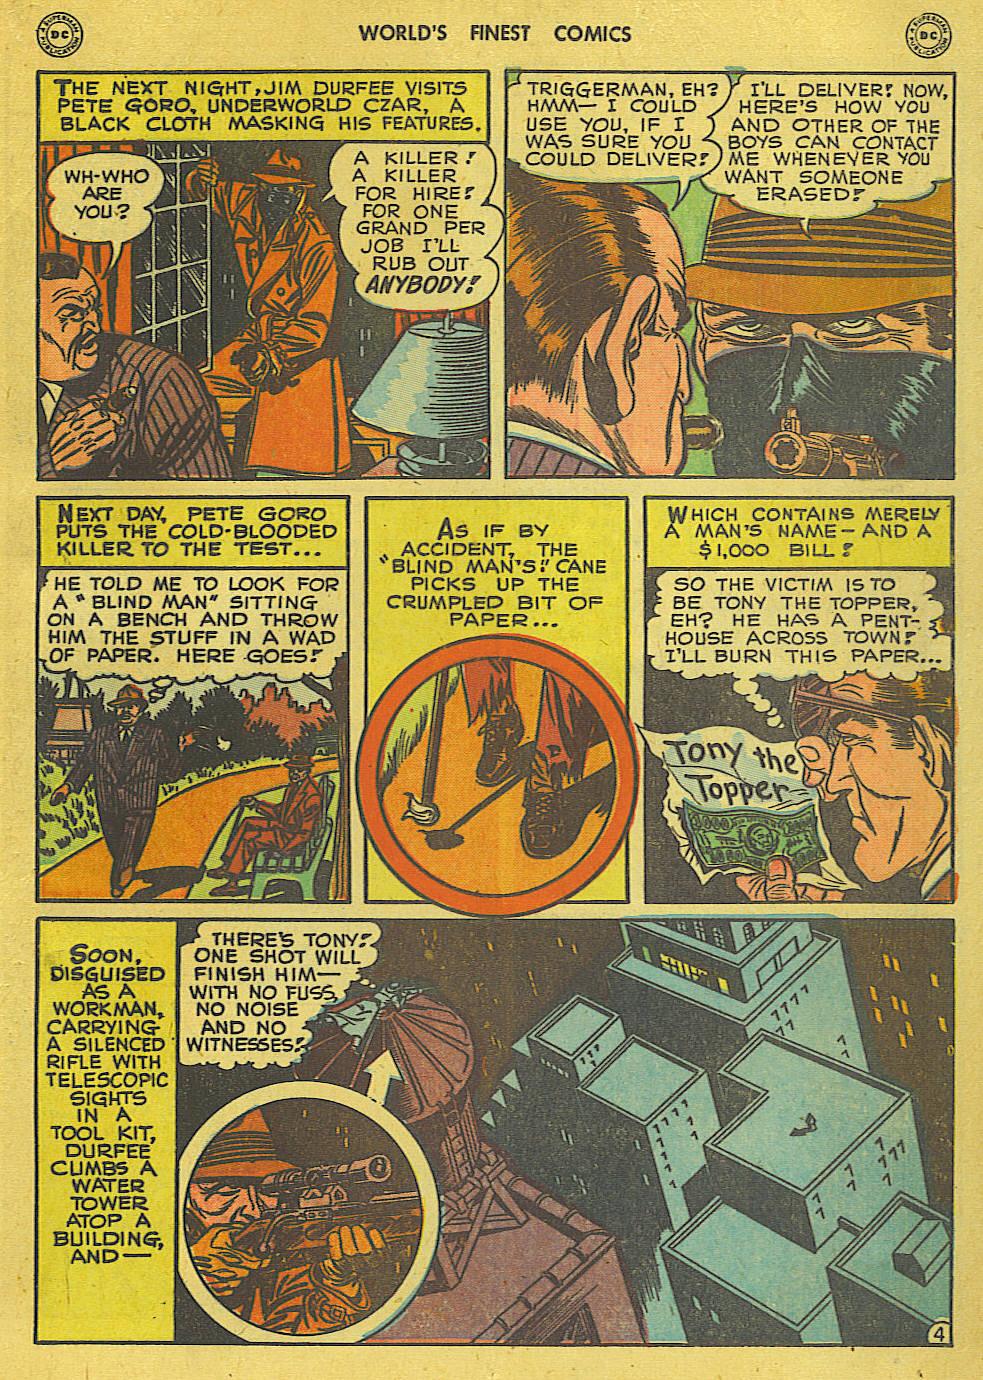 Read online World's Finest Comics comic -  Issue #34 - 65